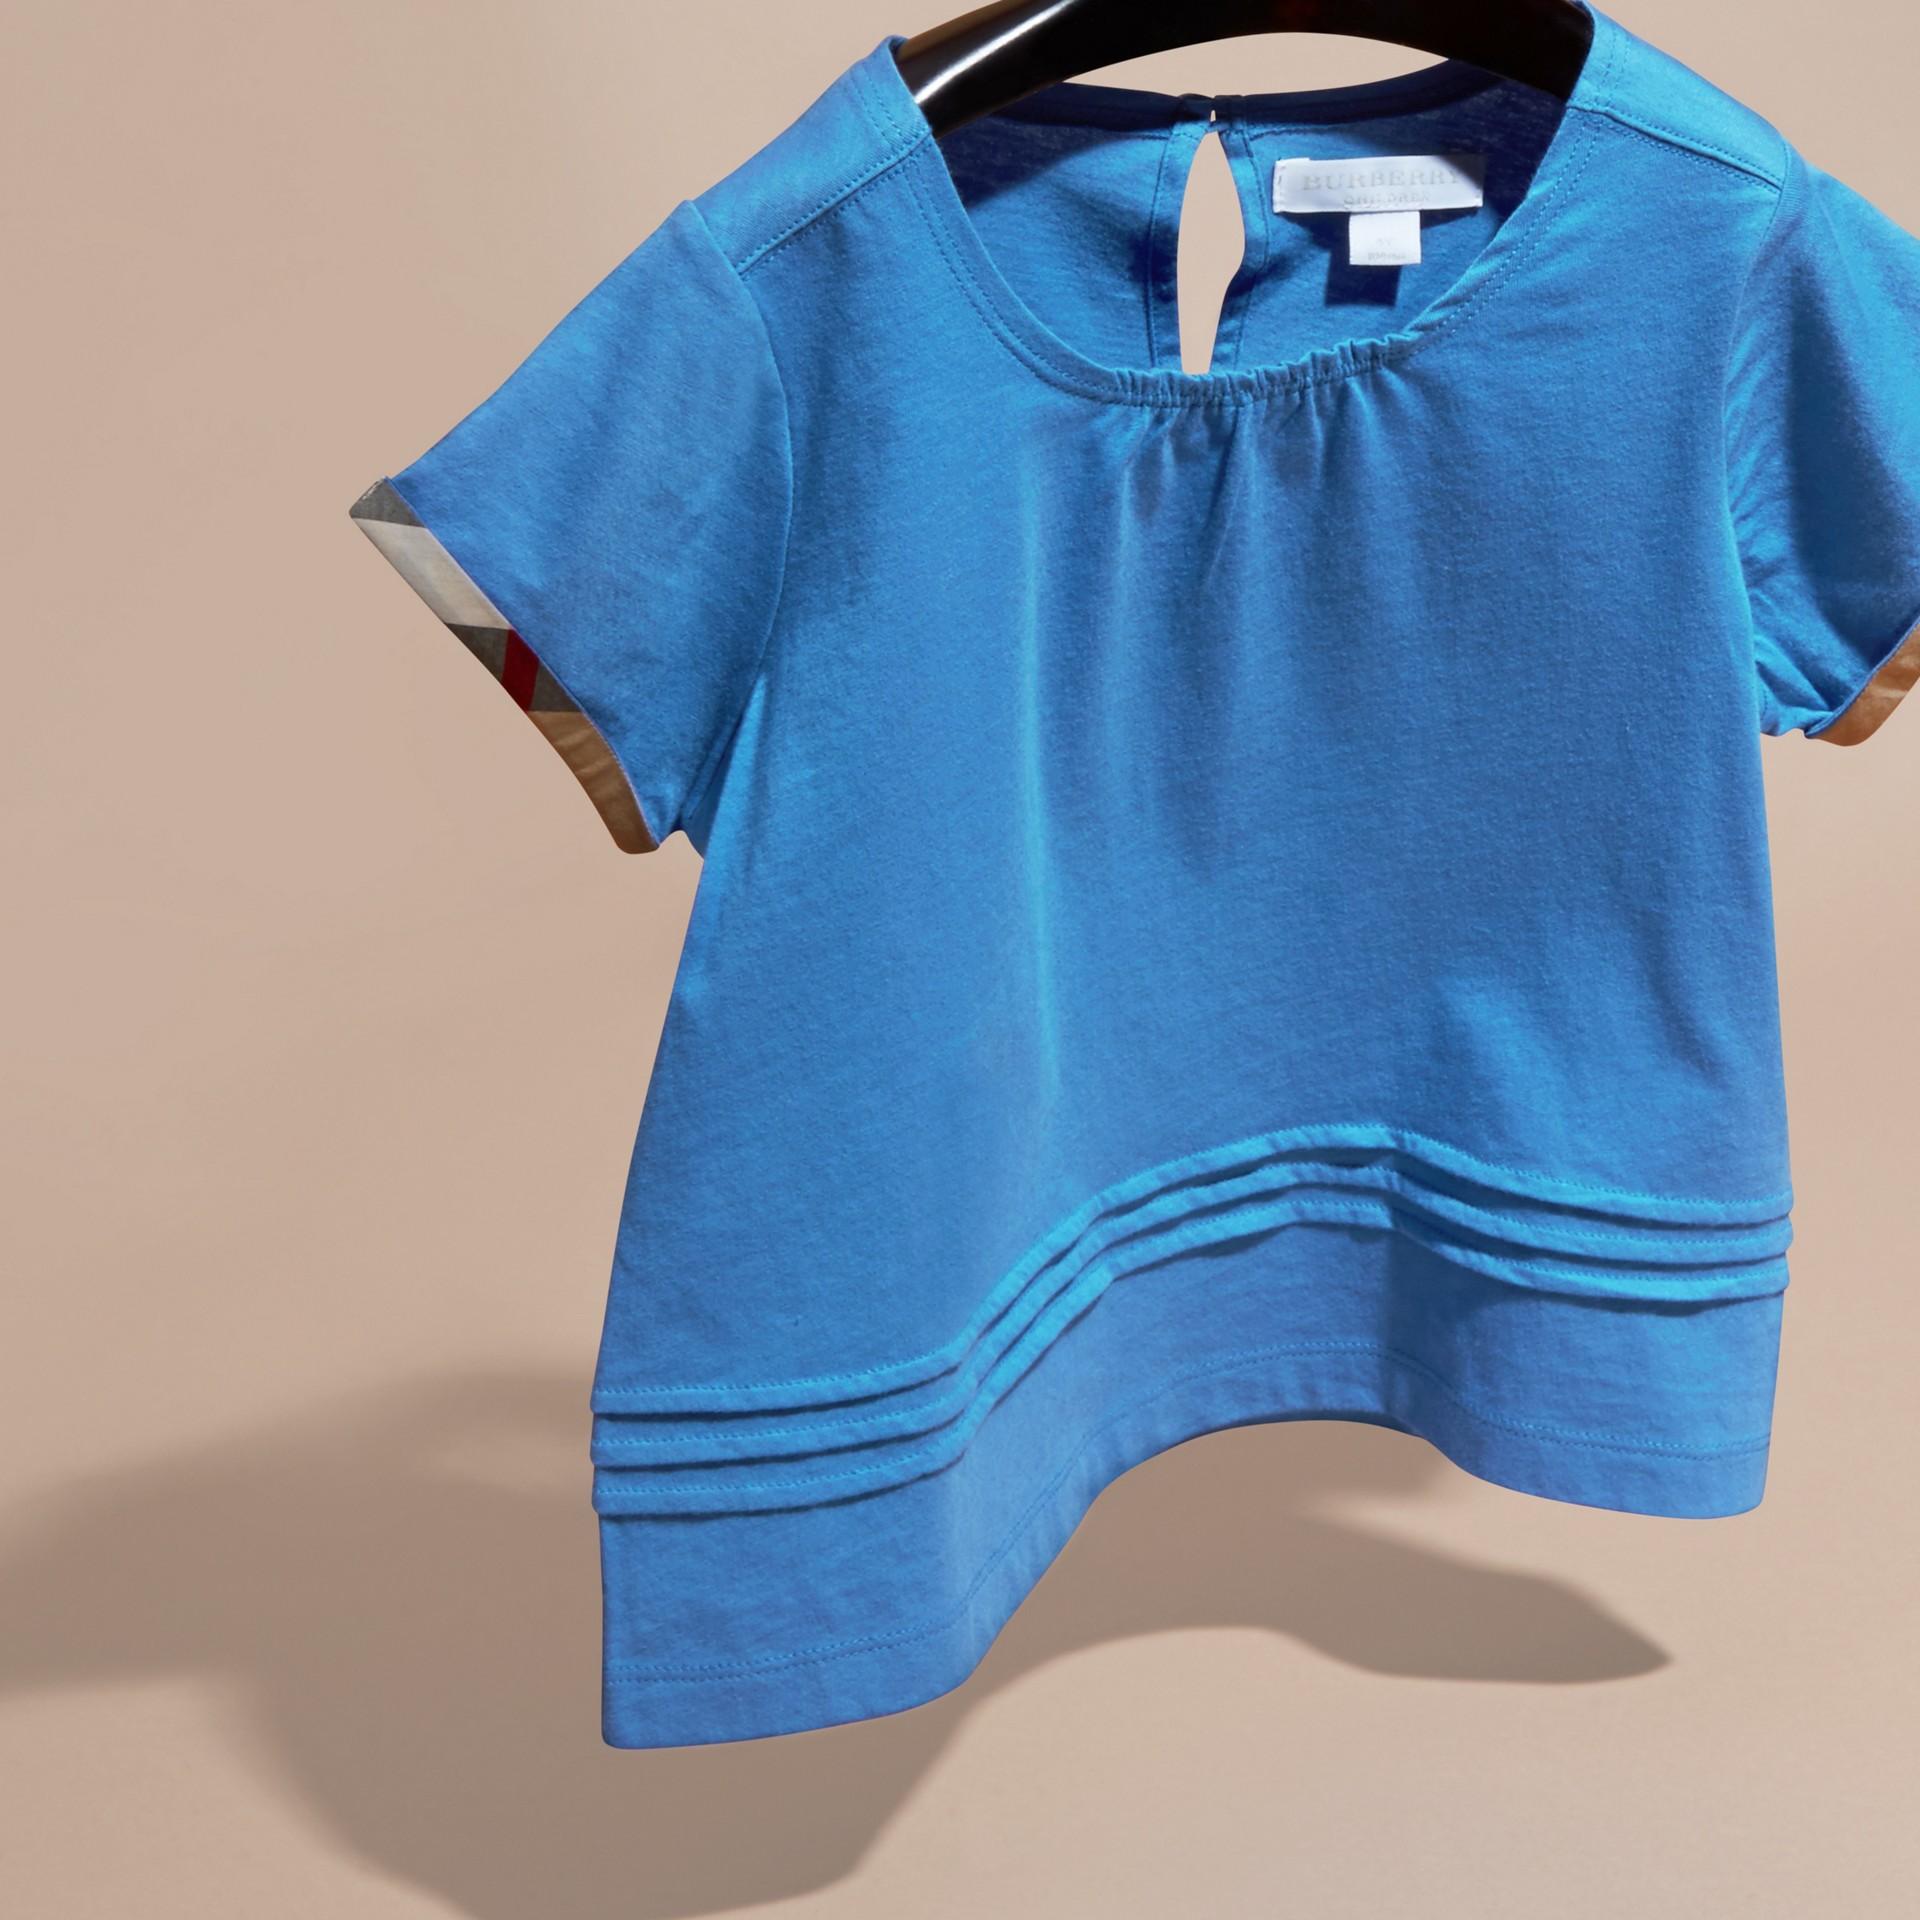 Bleu hortensia vif T-shirt à plis en coton à motif check Bleu Hortensia Vif - photo de la galerie 3